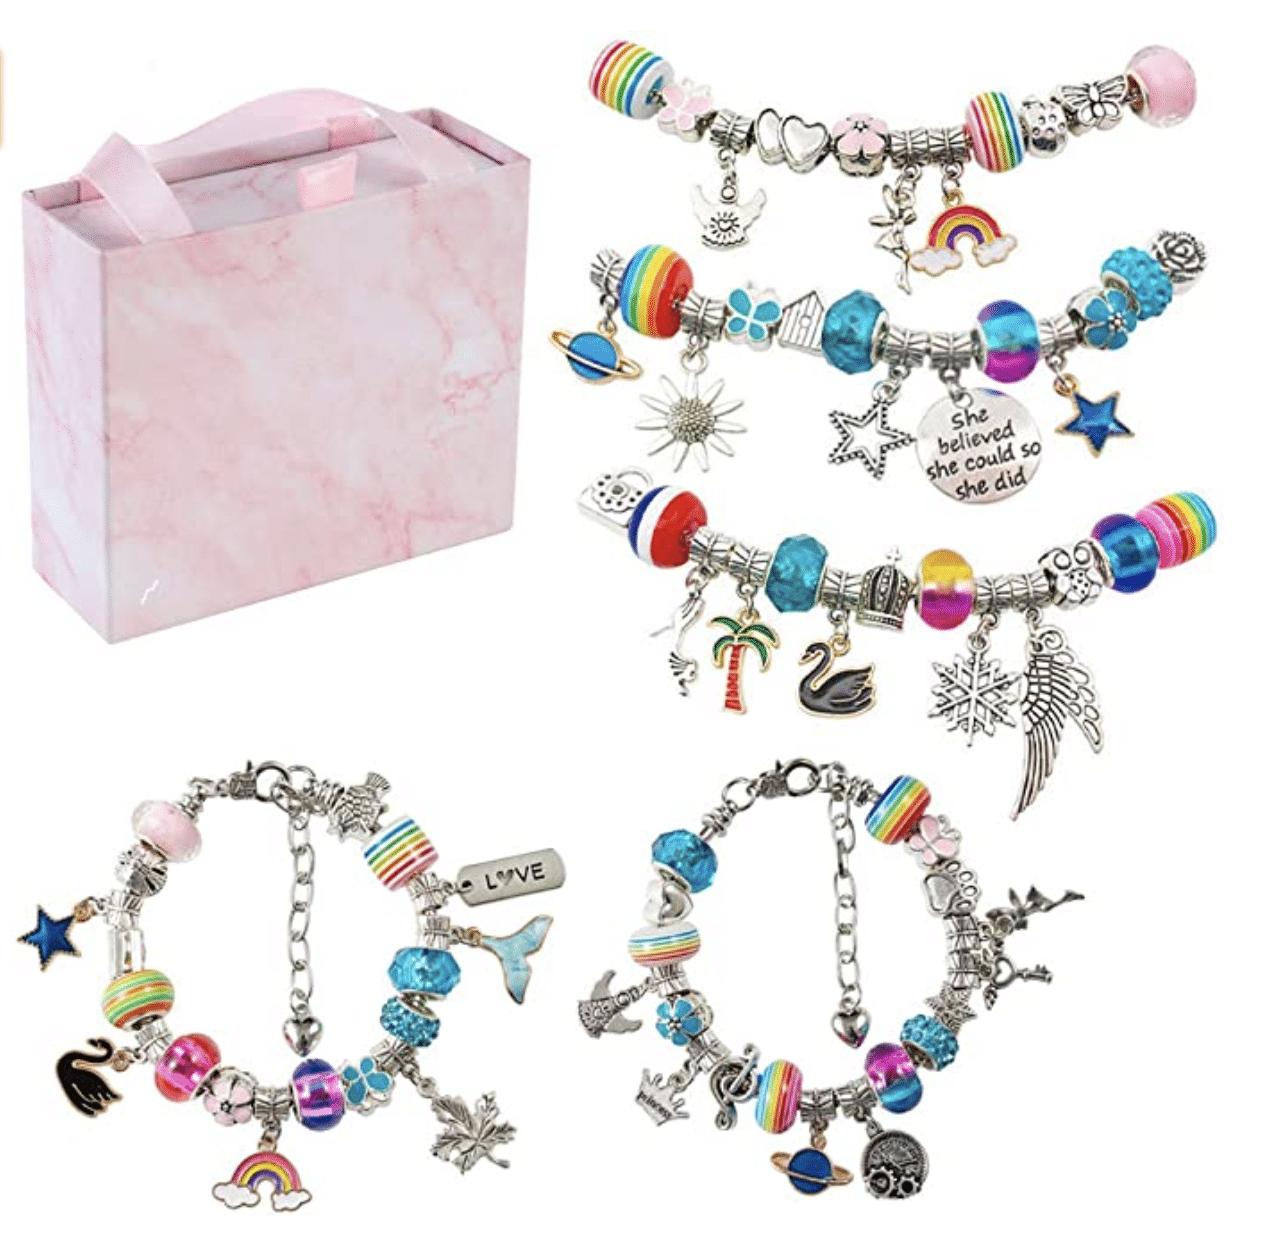 stocking-stuffer-ideas-for-kids-charm-bracelets